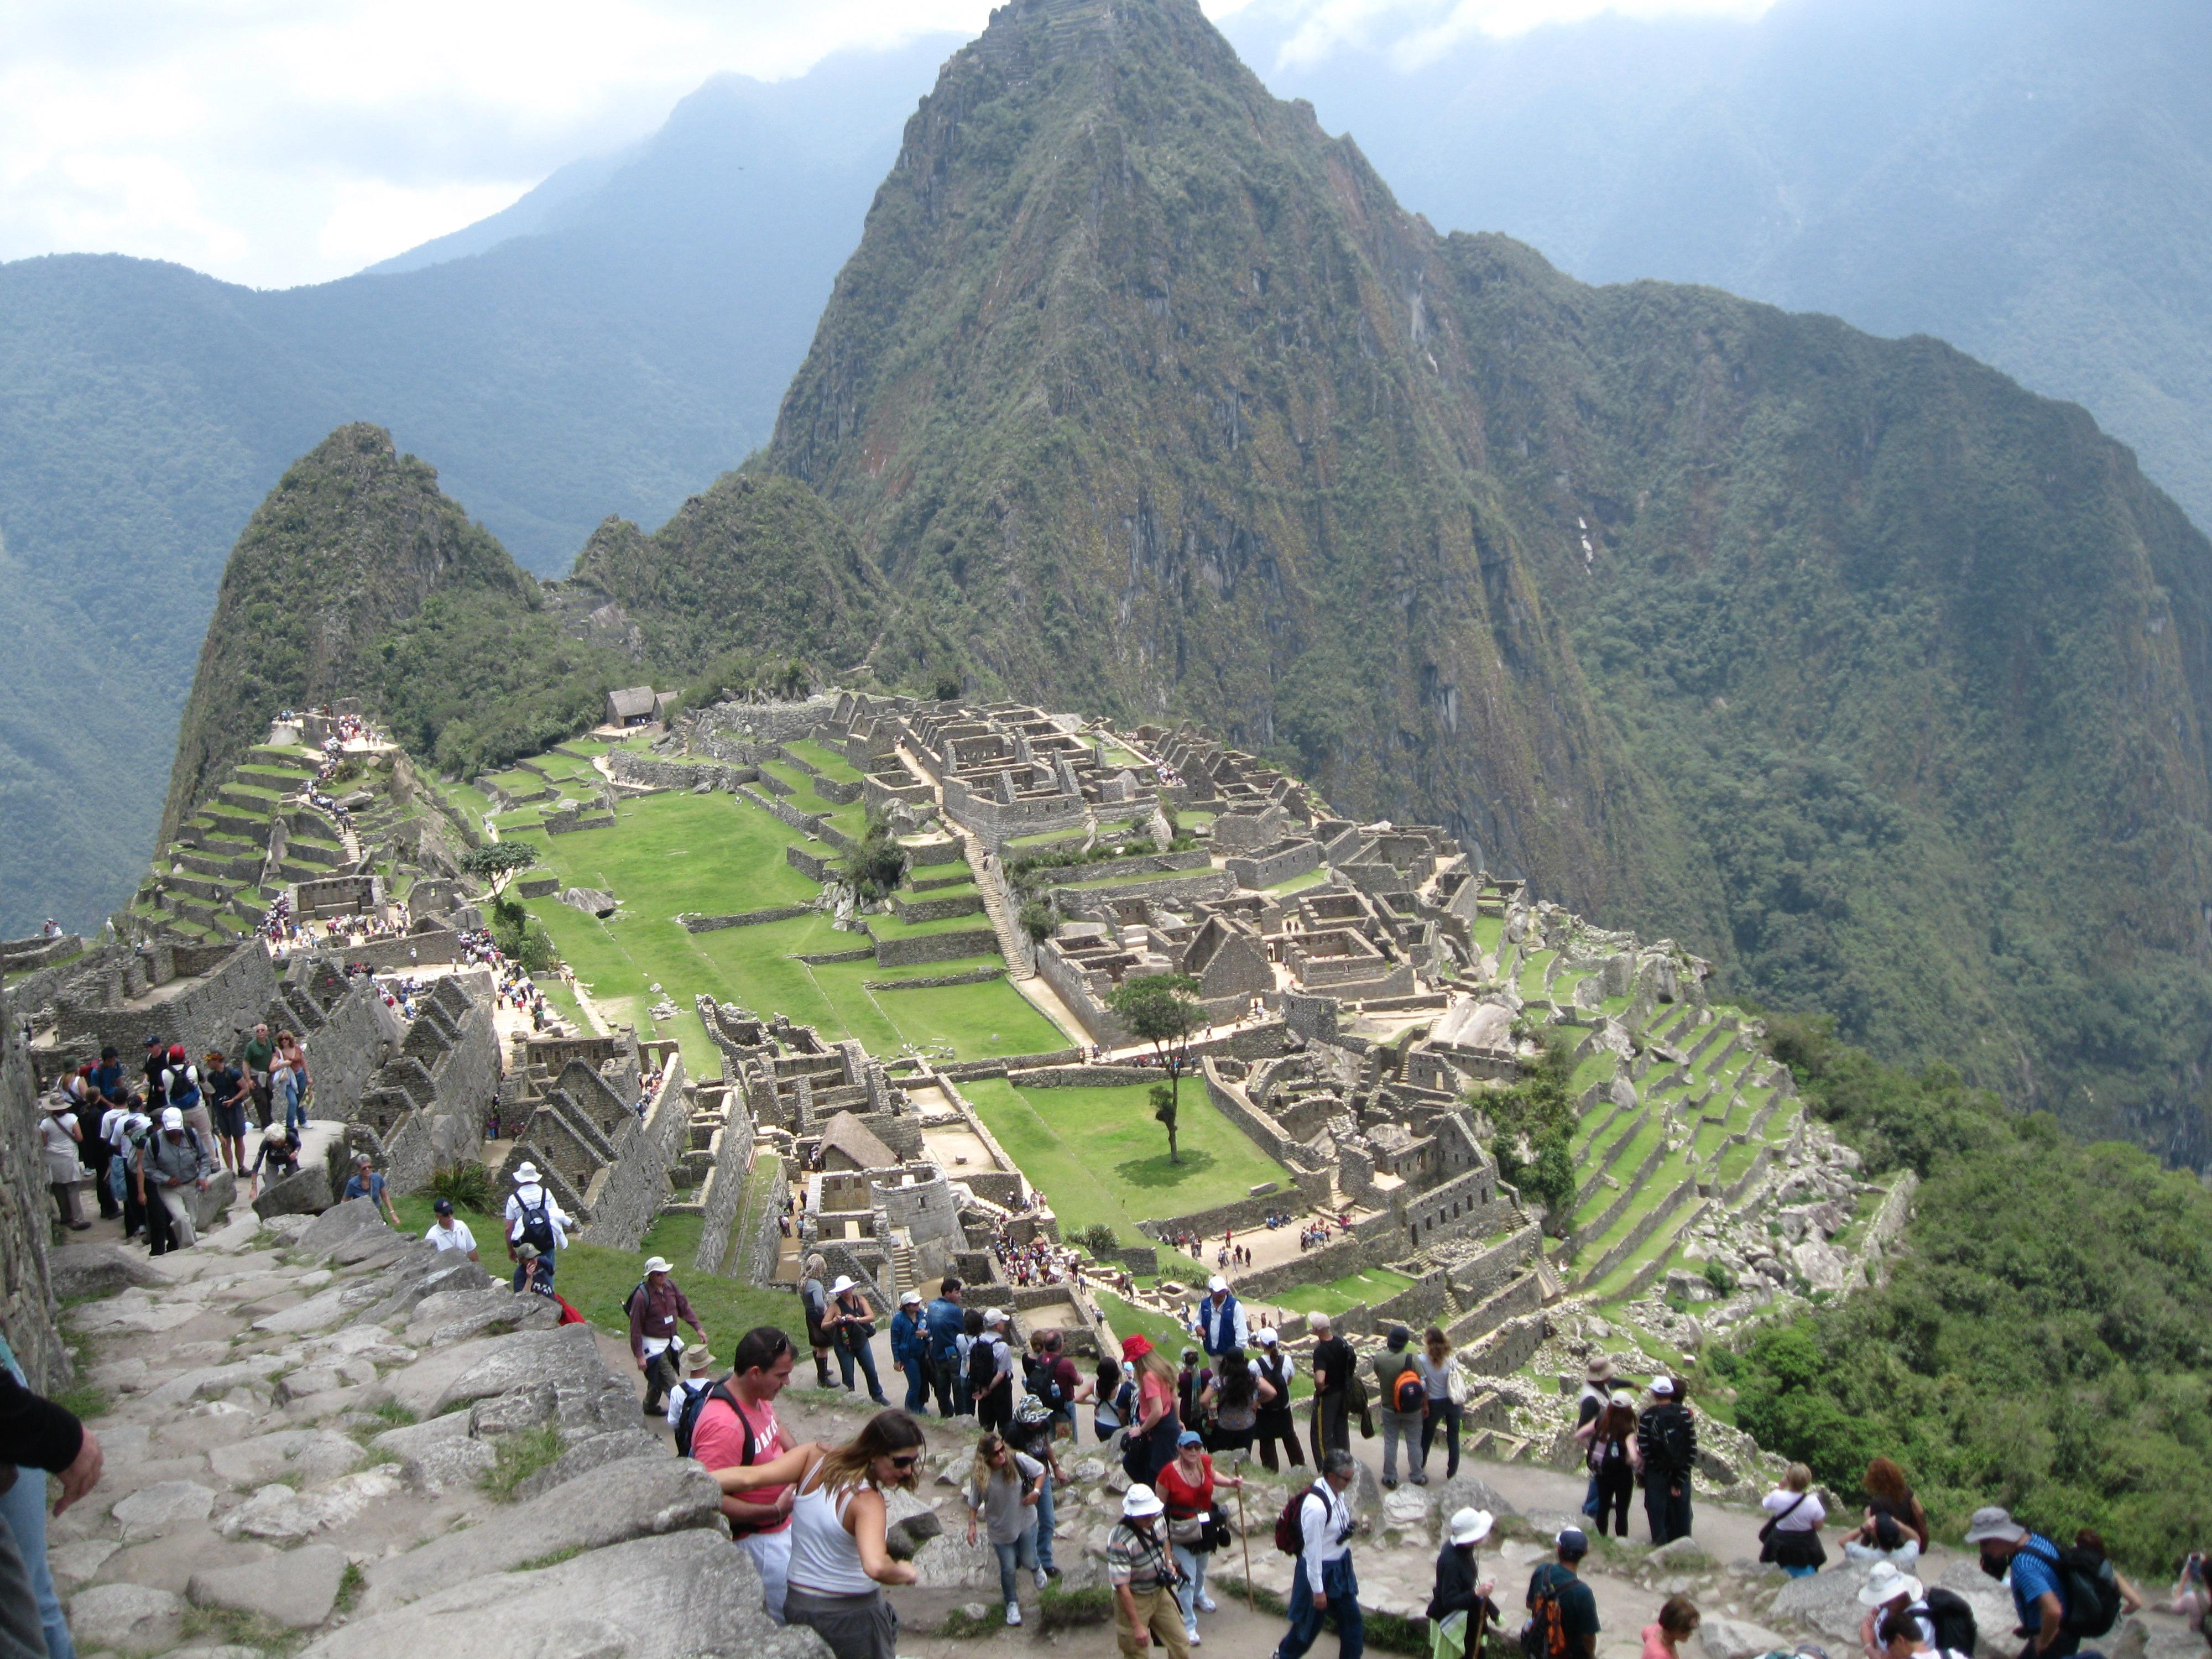 Macchu Picchu Tour Guide